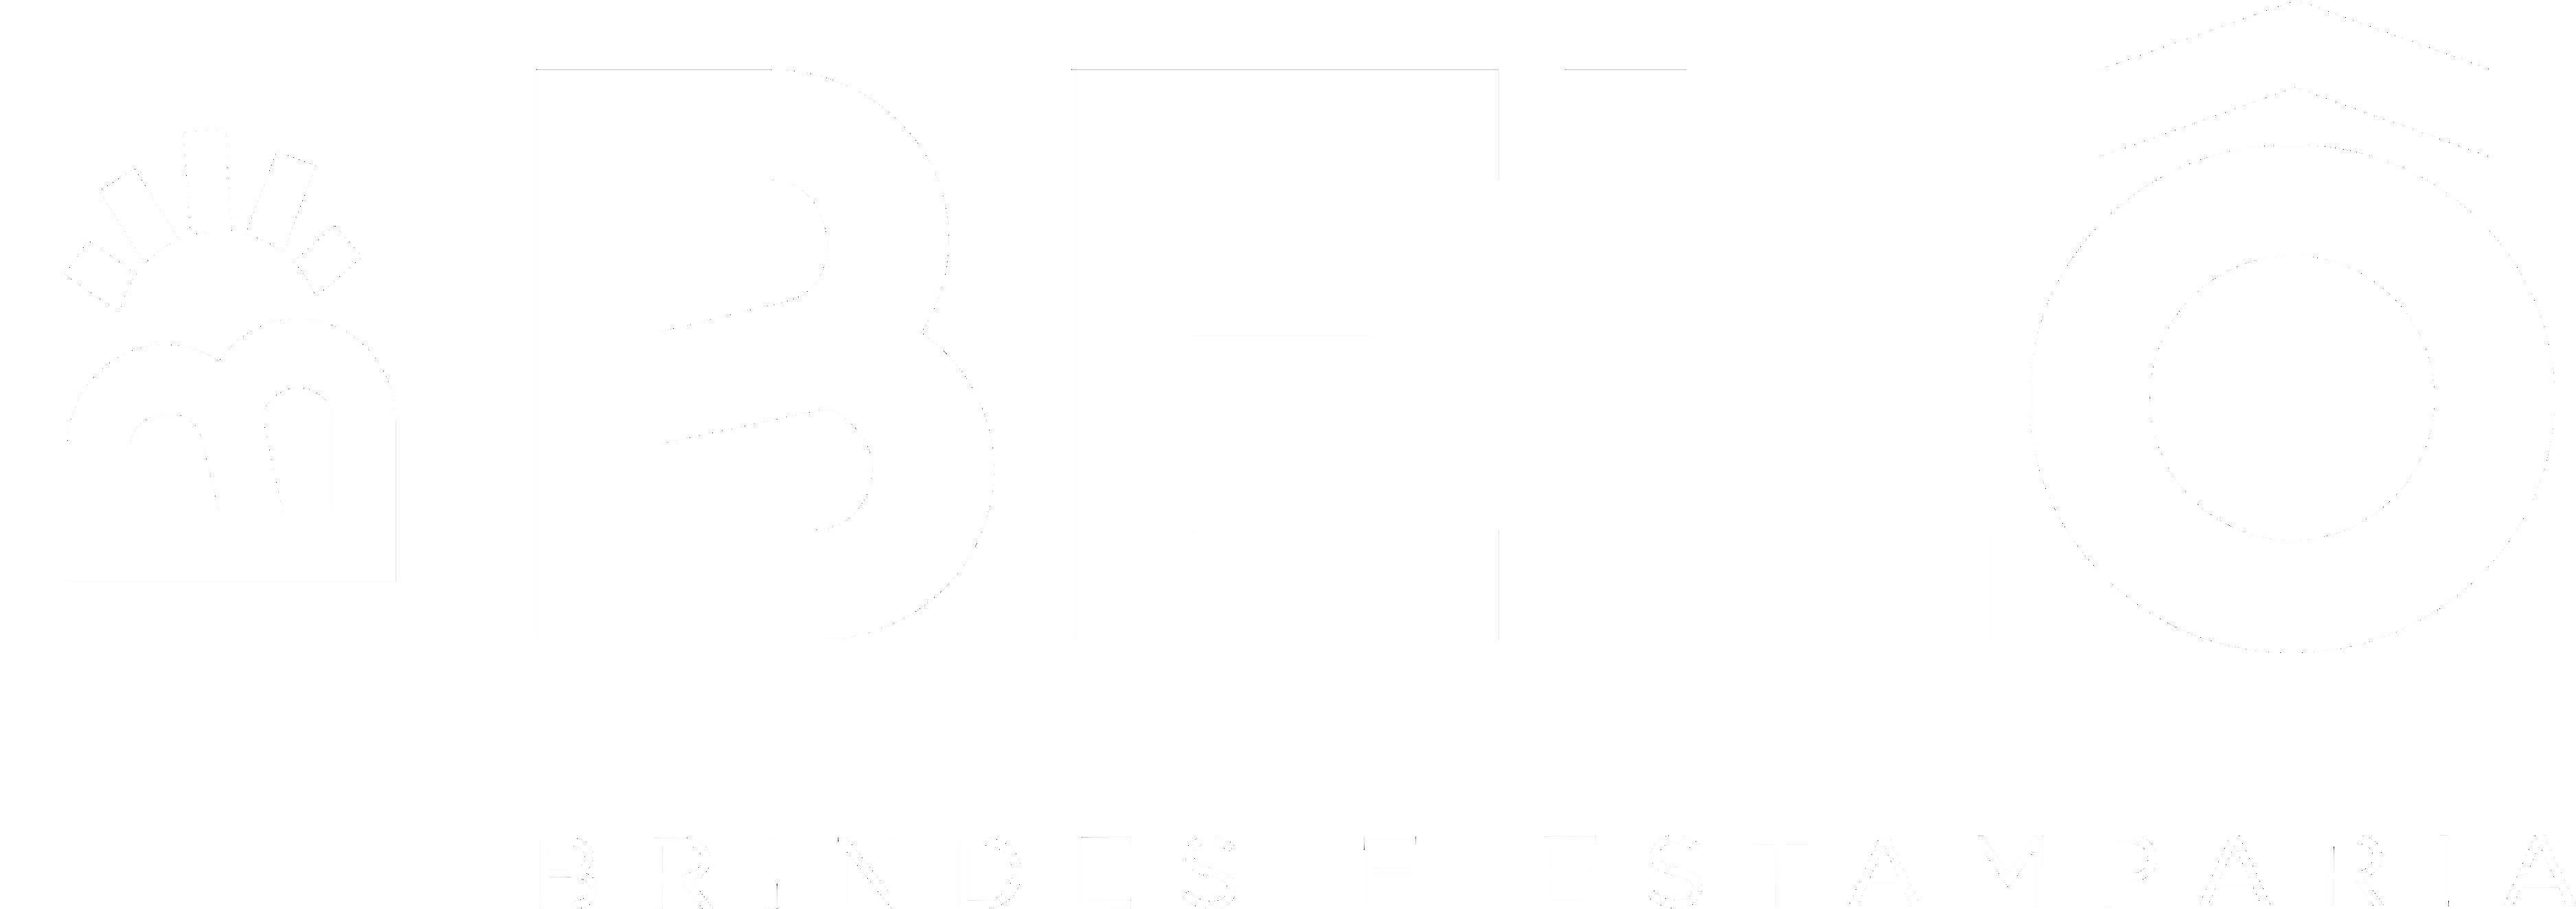 Belô Brindes e Estamparia